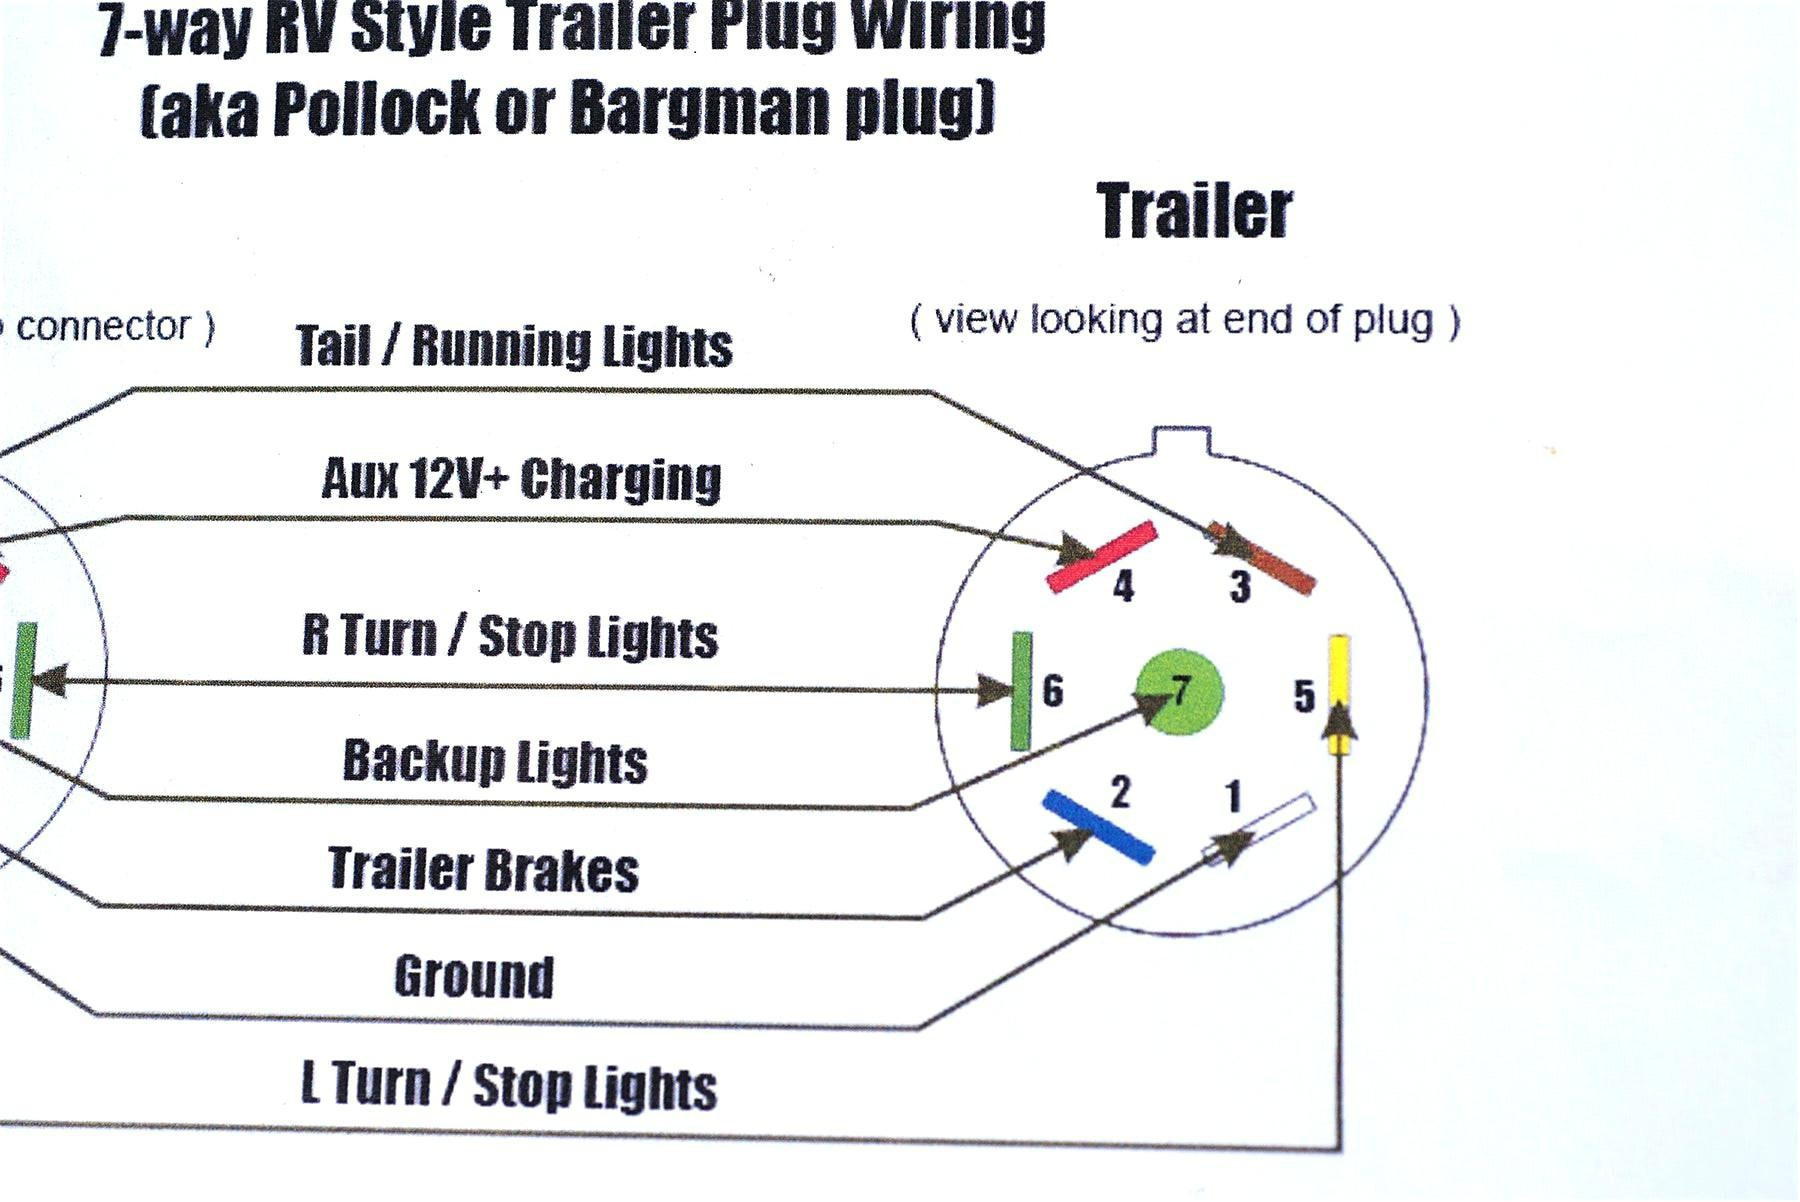 12 Pin Trailer Plug Wiring Diagram Best Of 4 Pin To 7 Pin Trailer - 4 Pin Trailer Plug Wiring Diagram